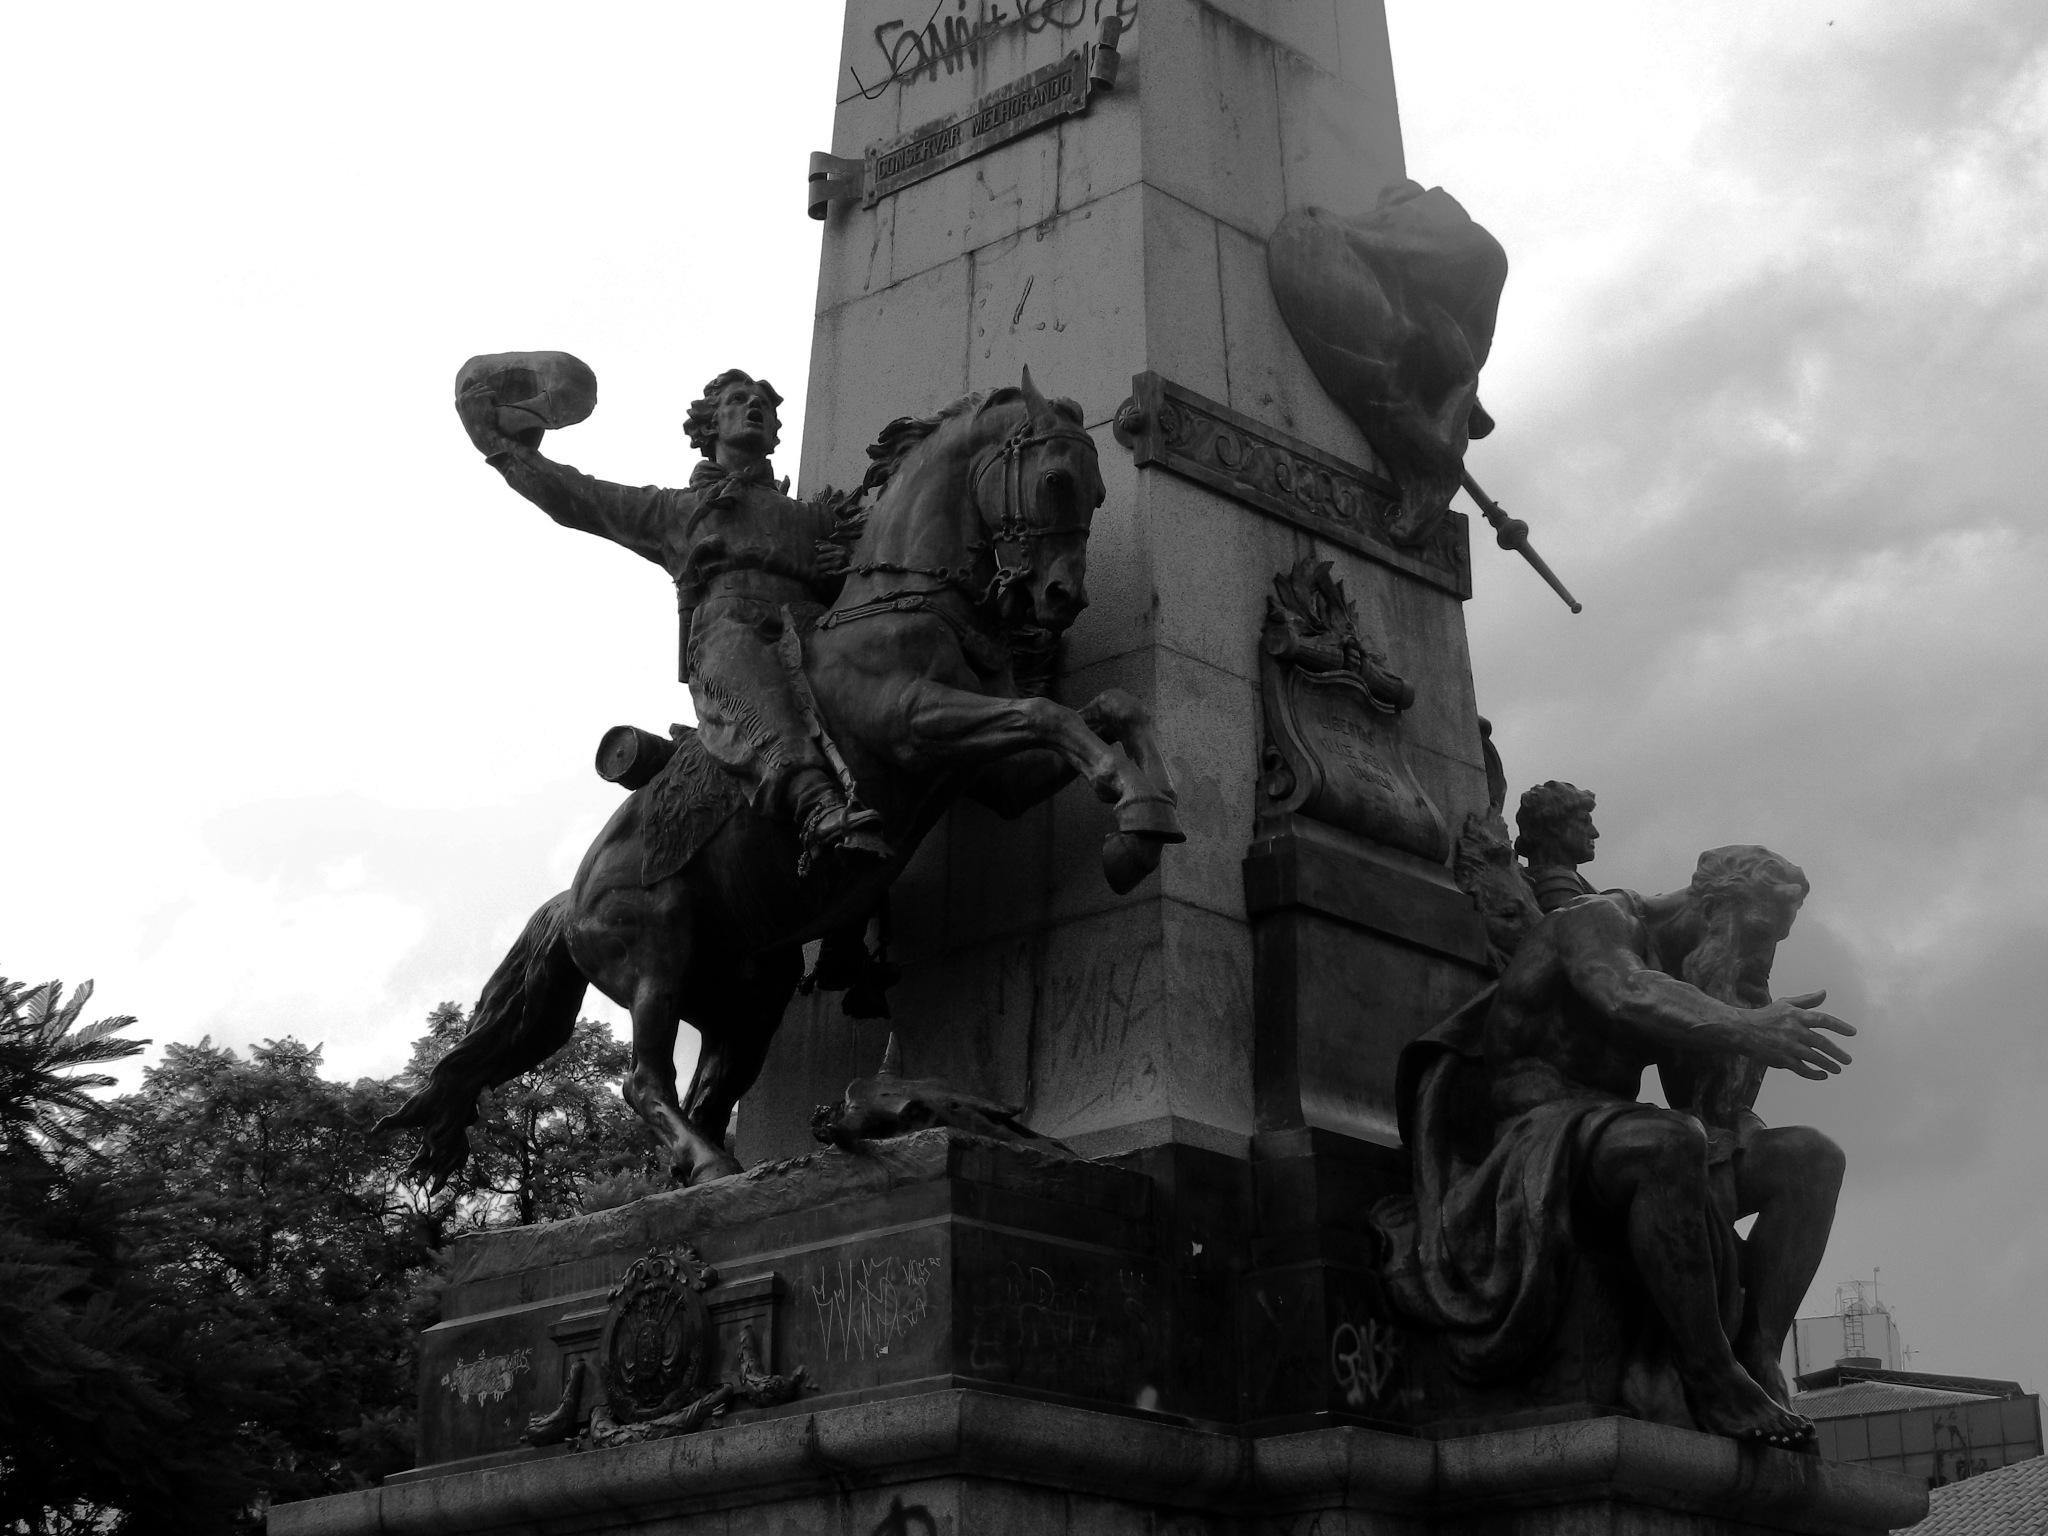 Monumento a Julio de Castilhos by roneilow